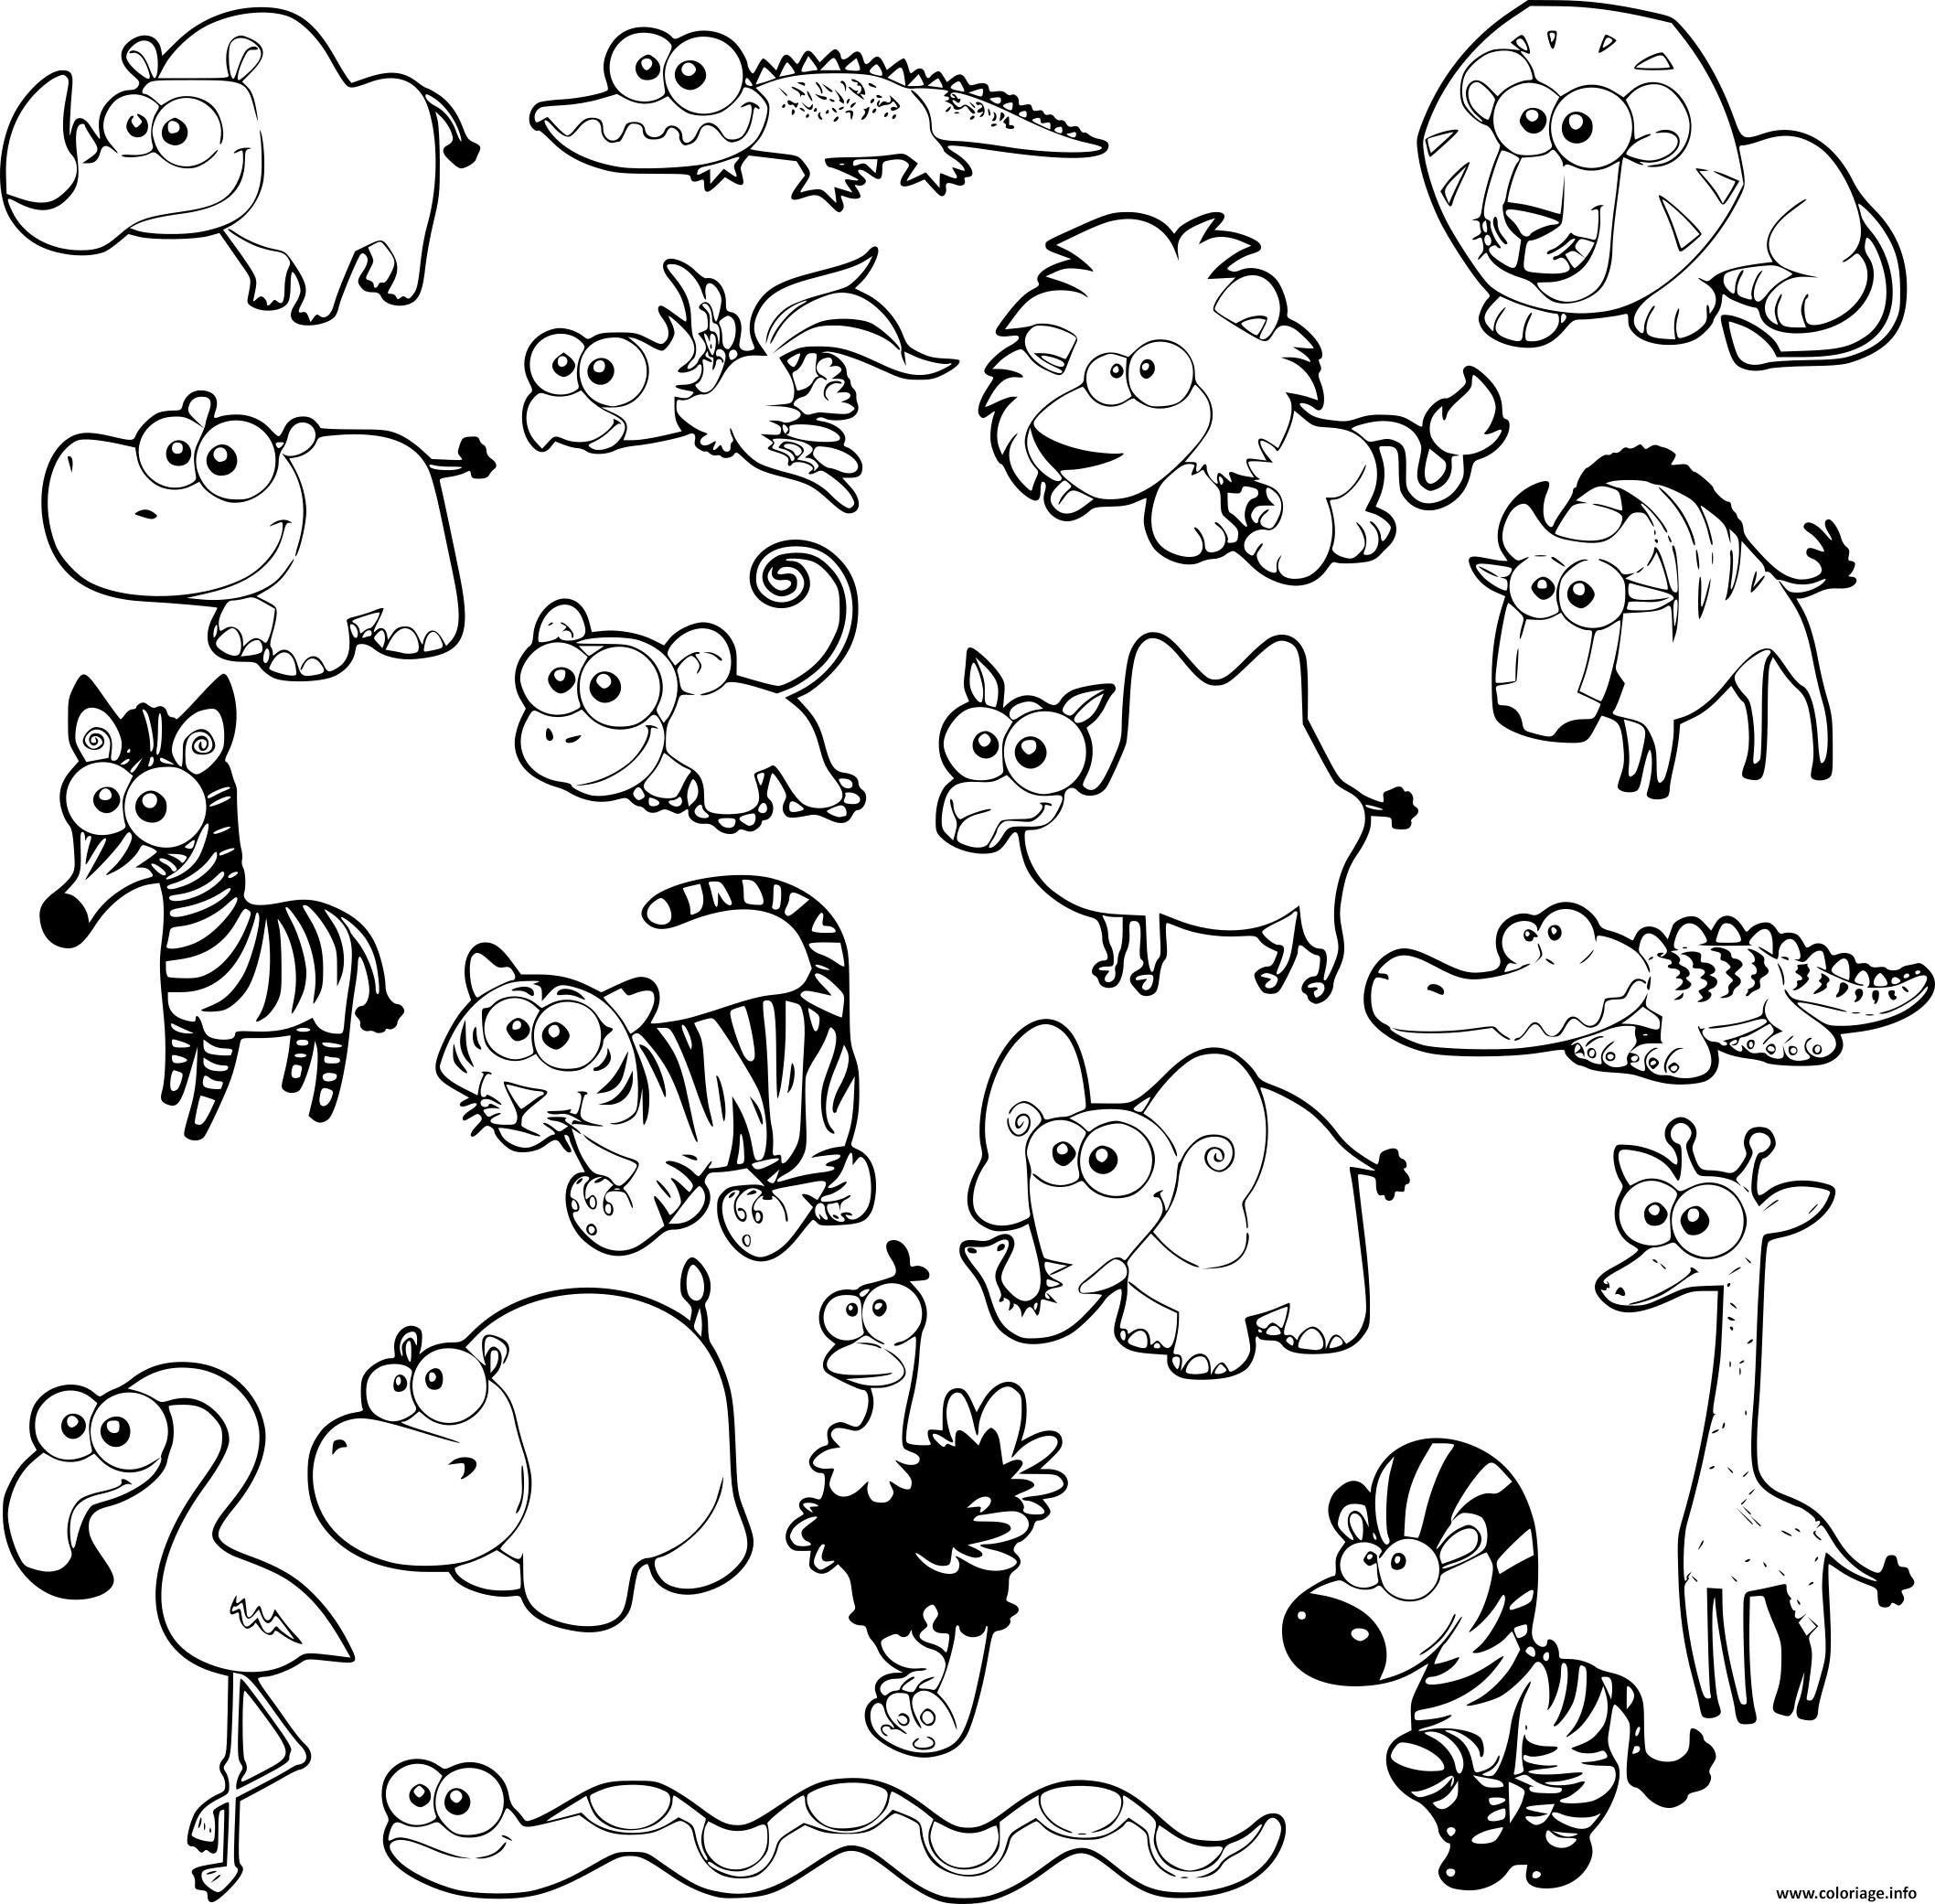 Coloriage Kawaii Animaux De La Savane A Imprimer Animaux De La Savane Coloriage Coloriage Animaux